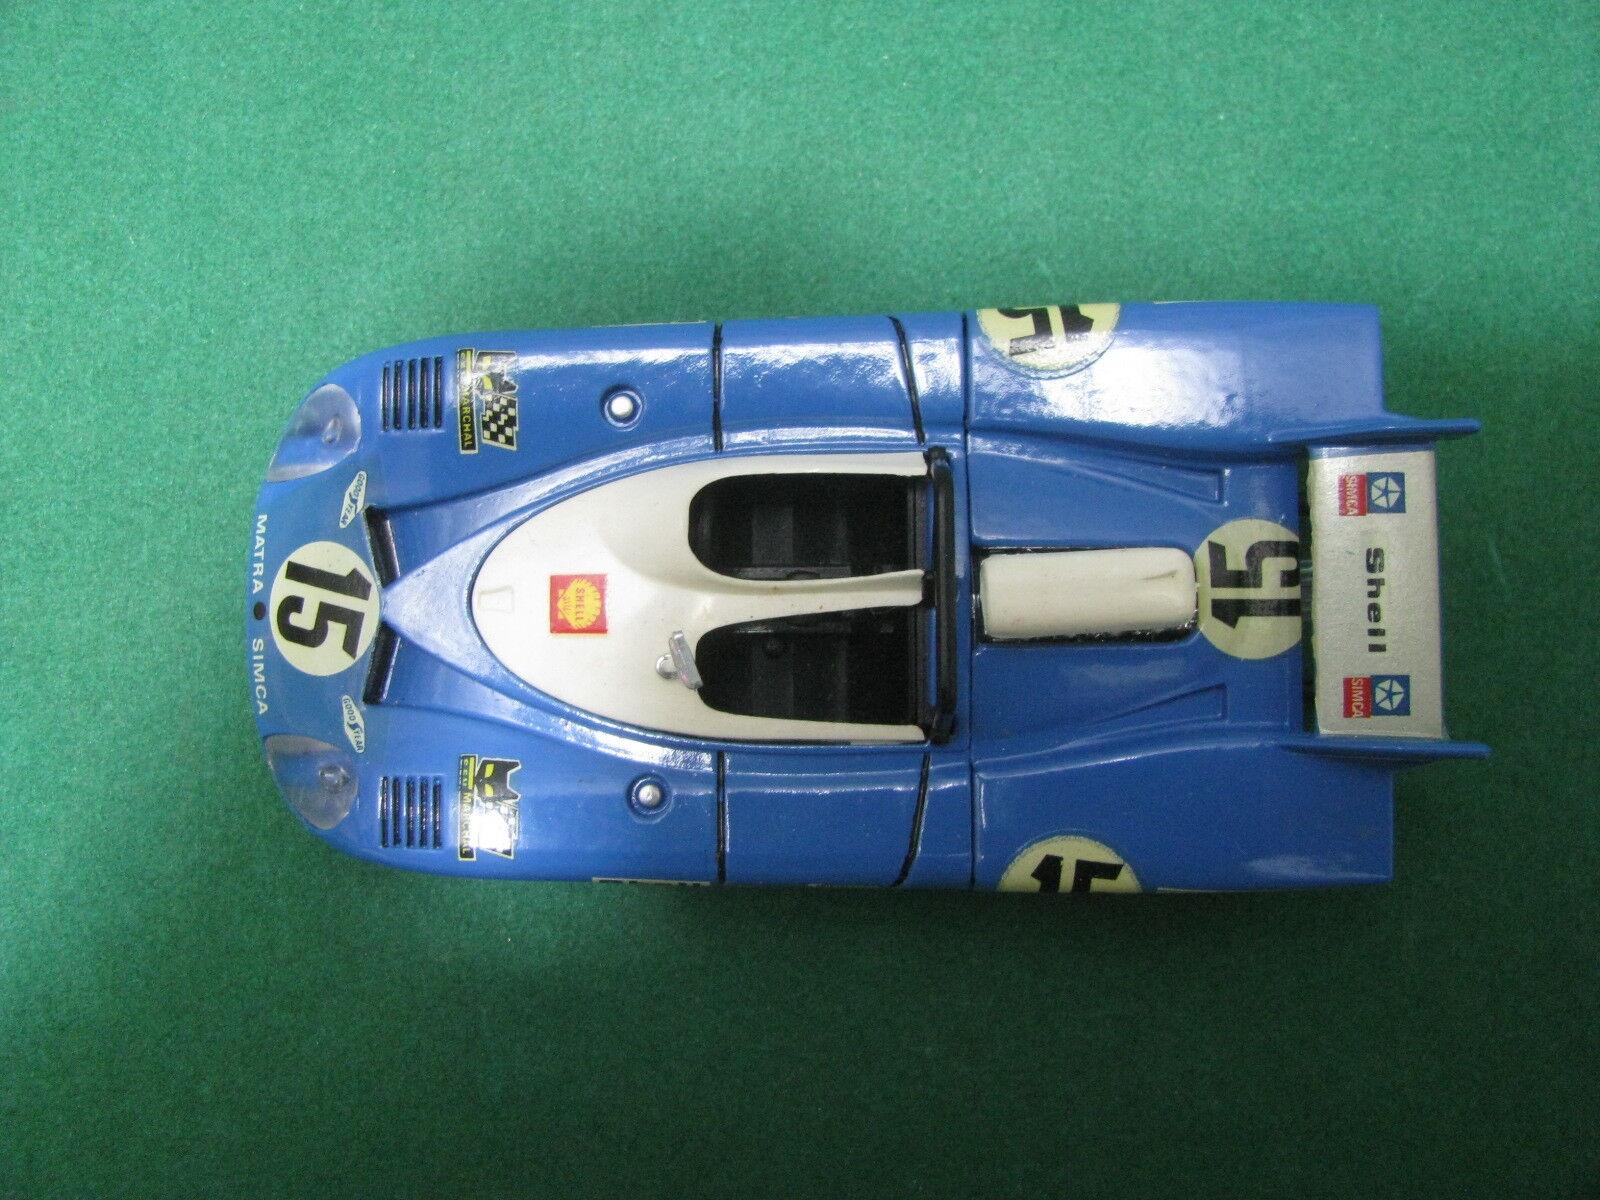 Vintage   -  MATRA-SIMCA  MS MS MS 670  Le Mans    - 1 43 Solido n°13 9b2a0c